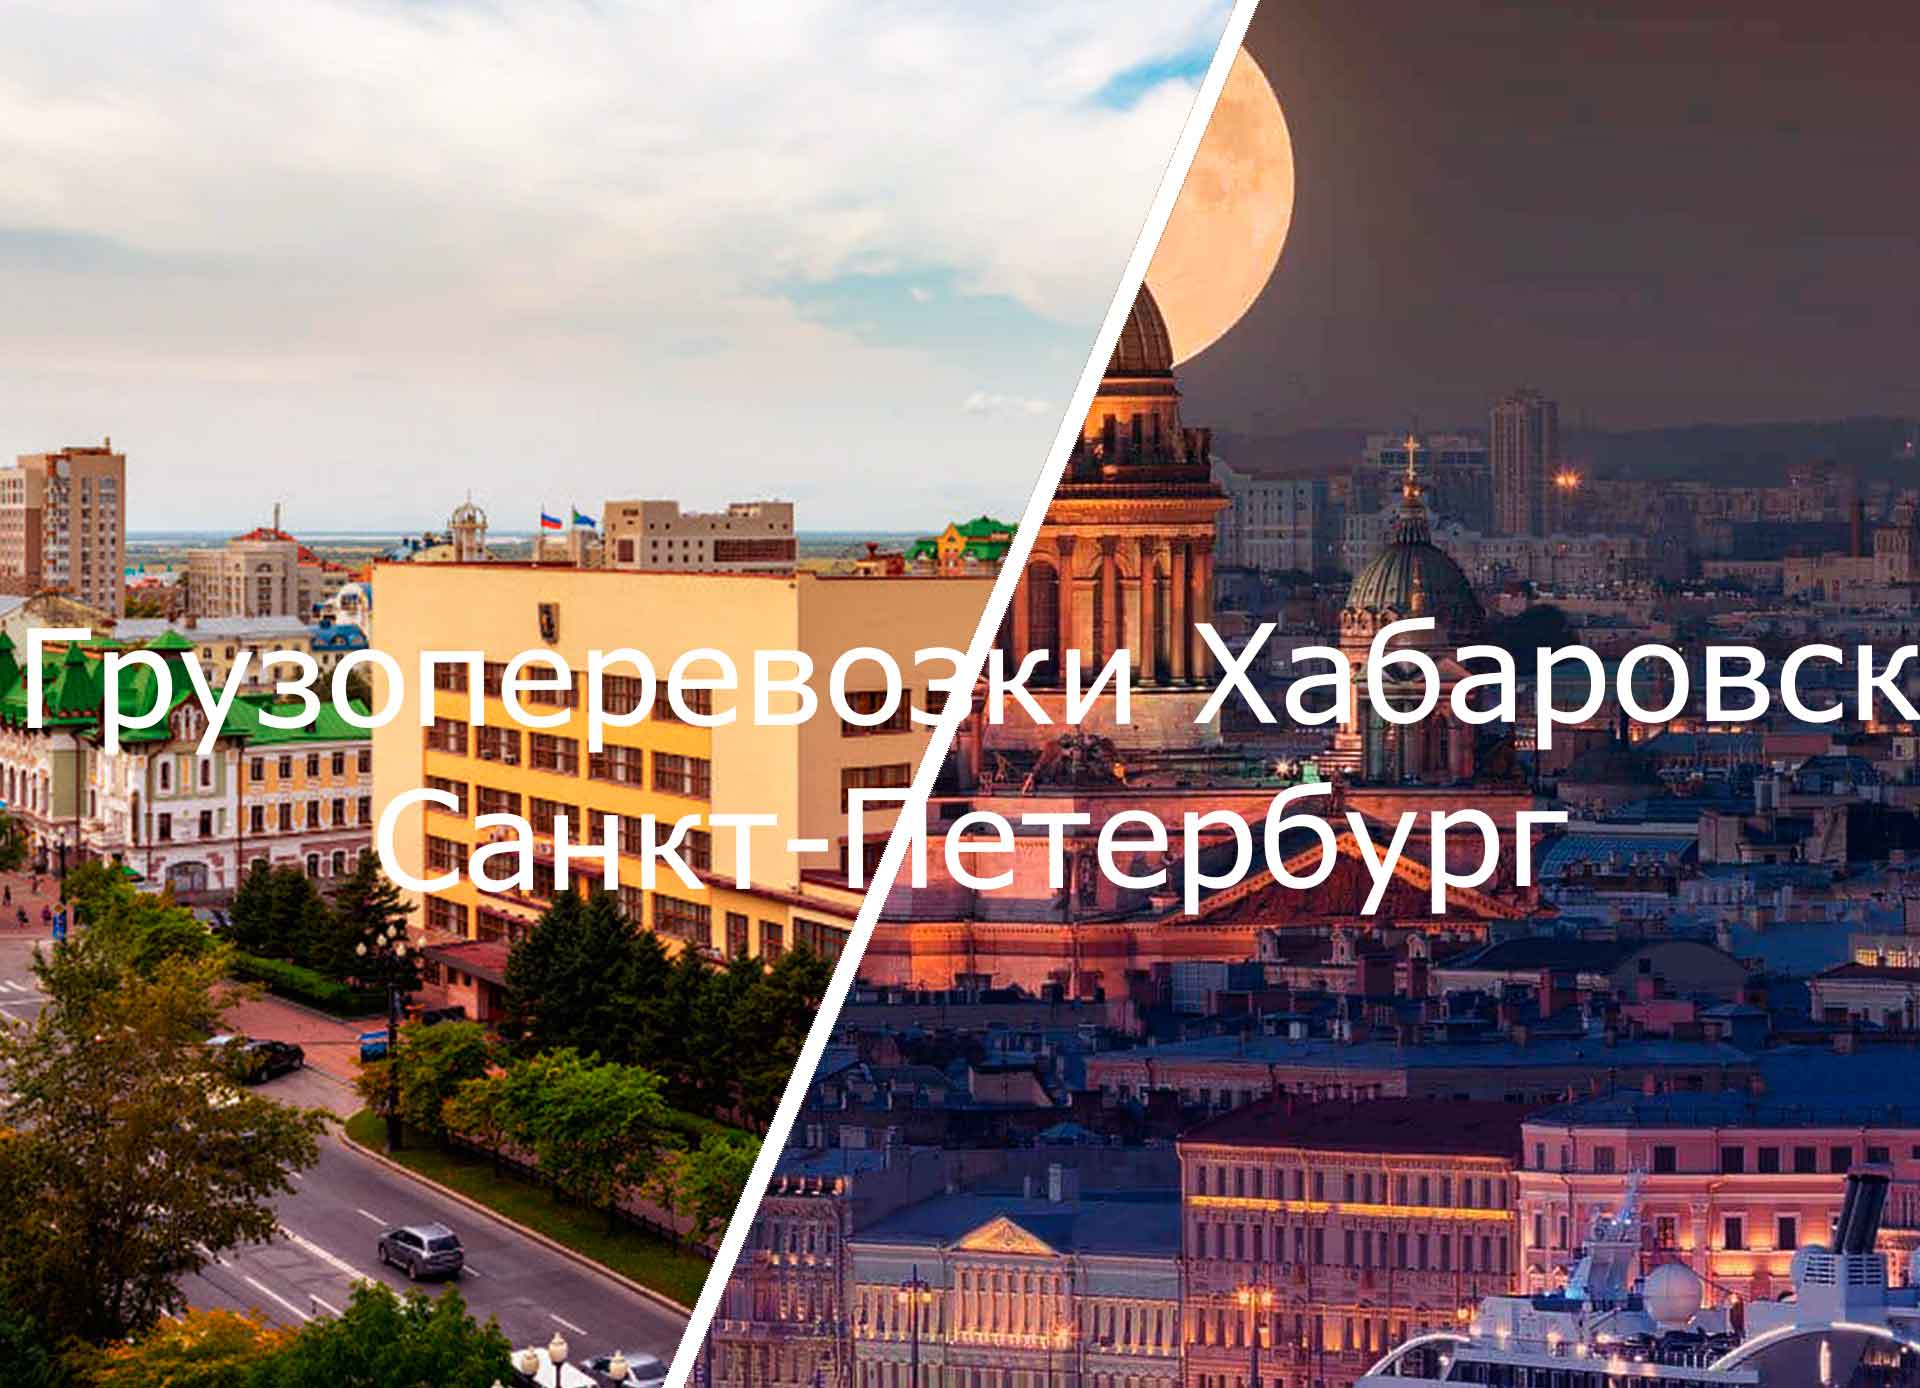 грузоперевозки хабаровск санкт петербург